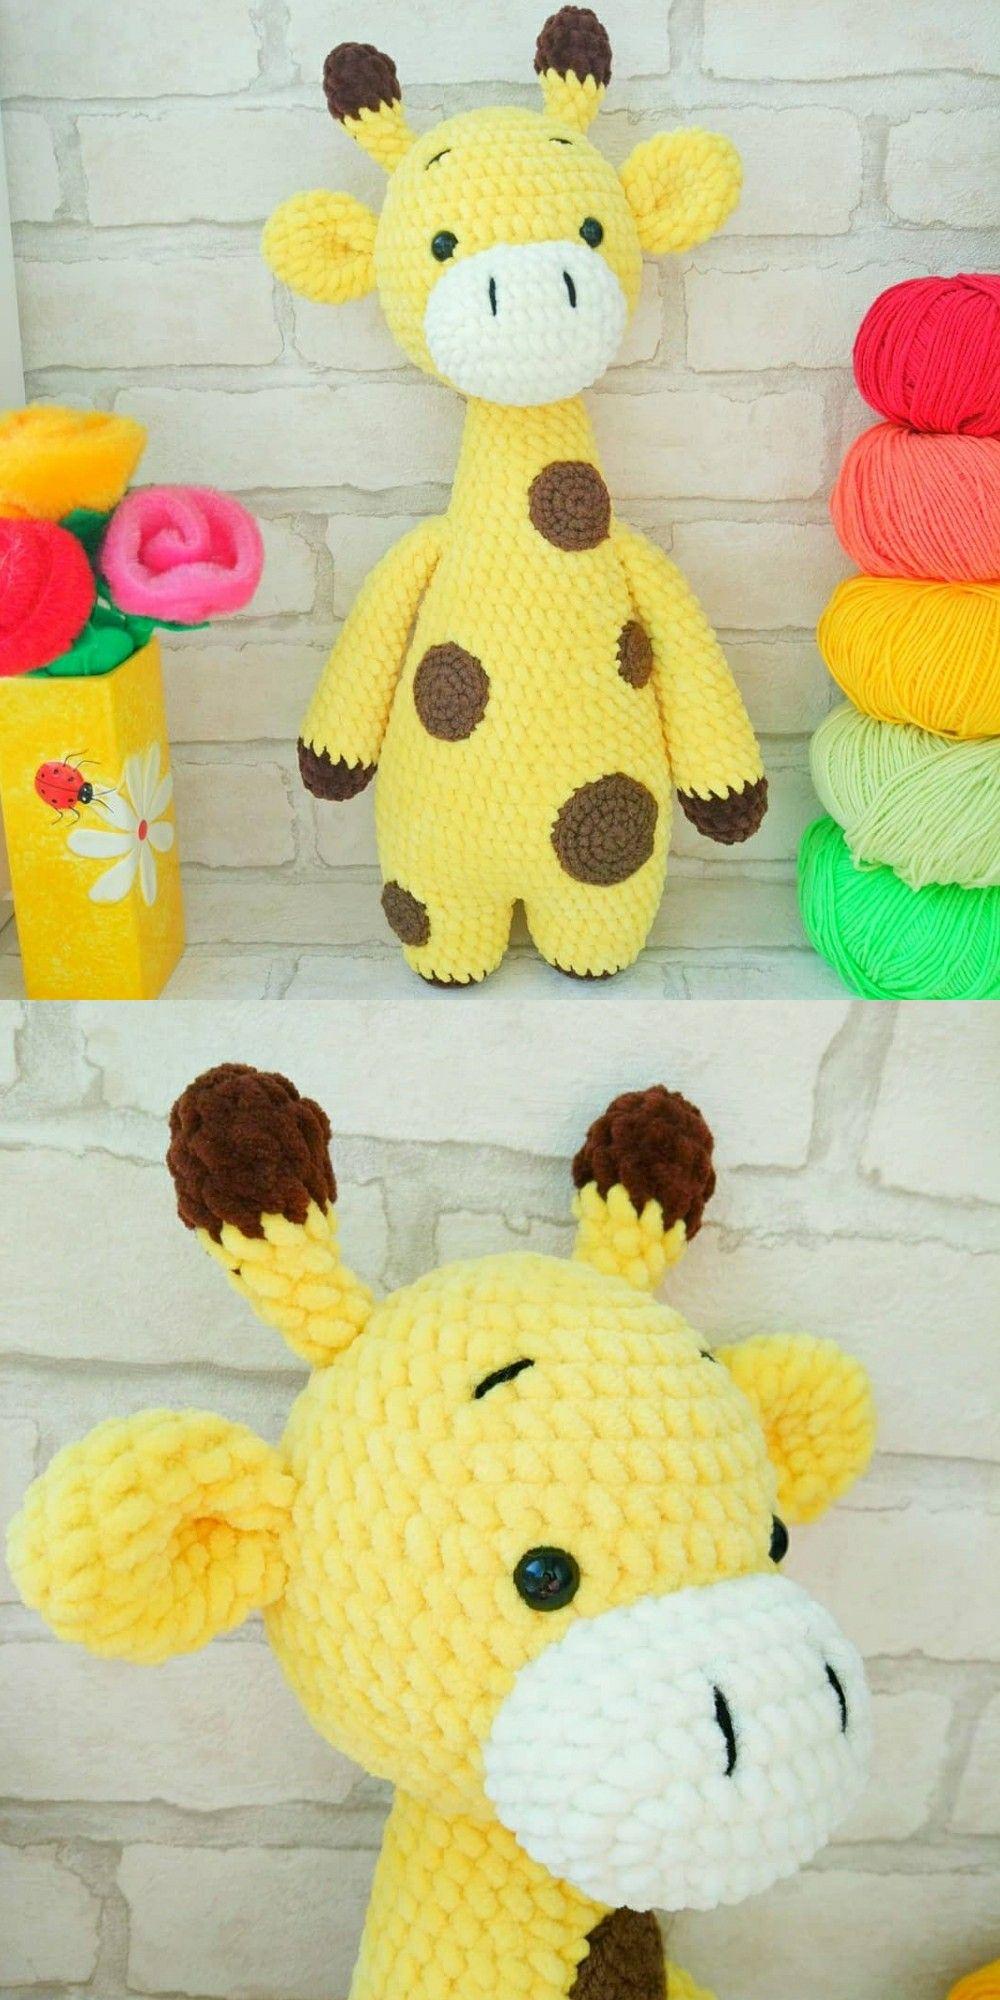 Схема вязания жирафа крючком, амигуруми схемы, жираф крючком, игрушки из плюшевой пряжи, вязаные игрушки, вязаный жираф, Мастер-класс амигуруми #crochetgiraffepattern